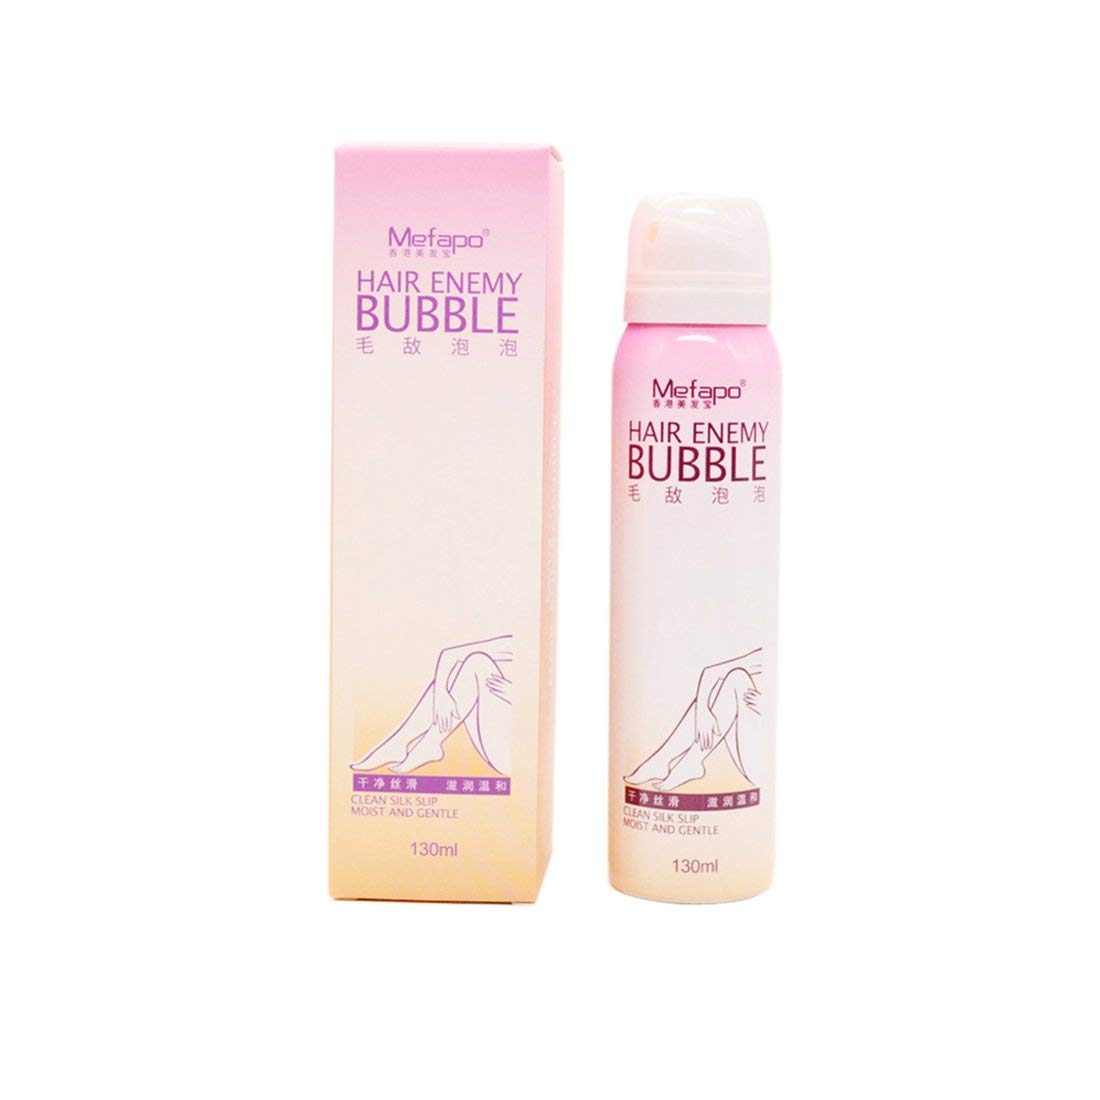 Natural Hair Removal Cream For Men & Women Painless Permanent Hair Removal Spray Gentle Bikini Depilatory Bubble - White Formulaone